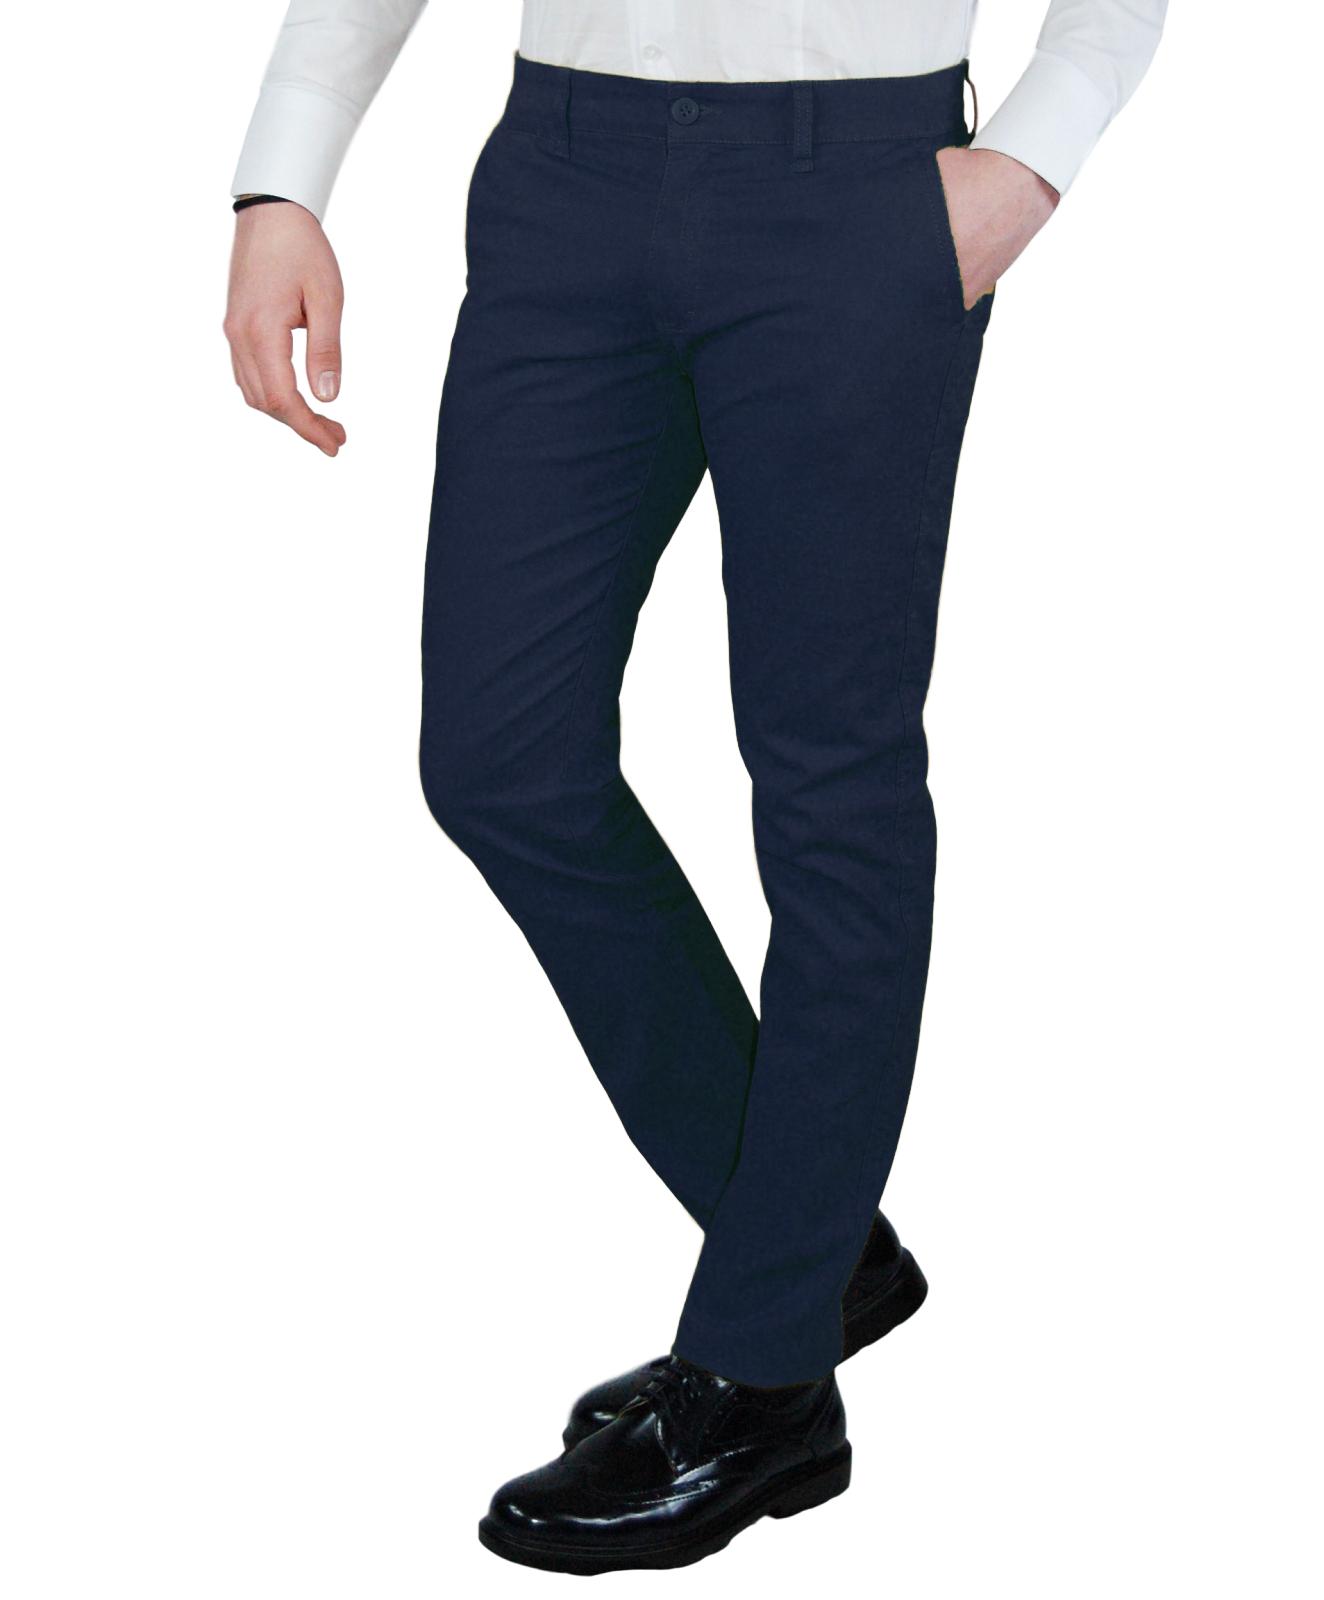 Pantalone-Uomo-Invernale-Slim-Fit-Chino-tasca-america-Cotone-Blu-Nero-Verde miniatura 18